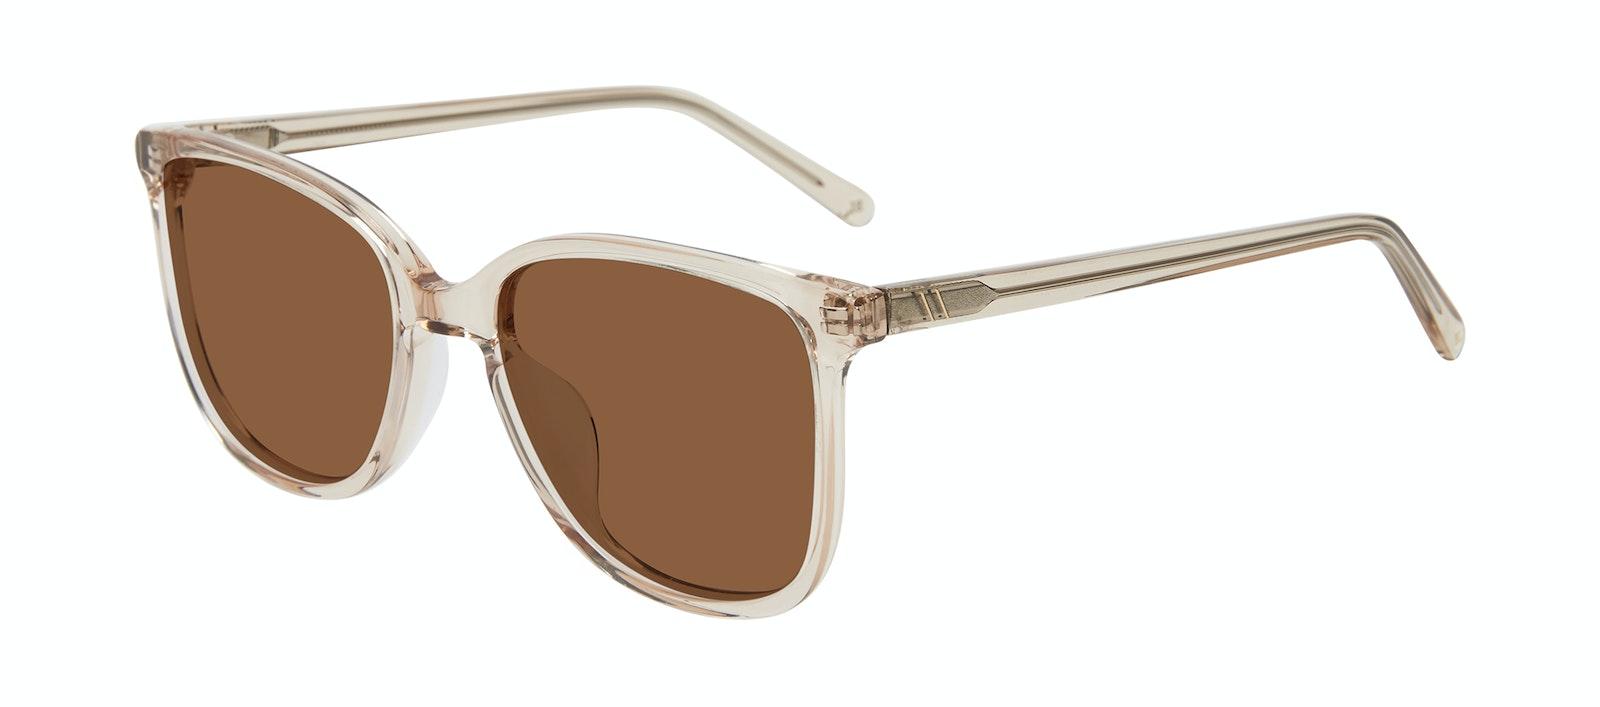 Affordable Fashion Glasses Square Sunglasses Women Lead Blond Tilt